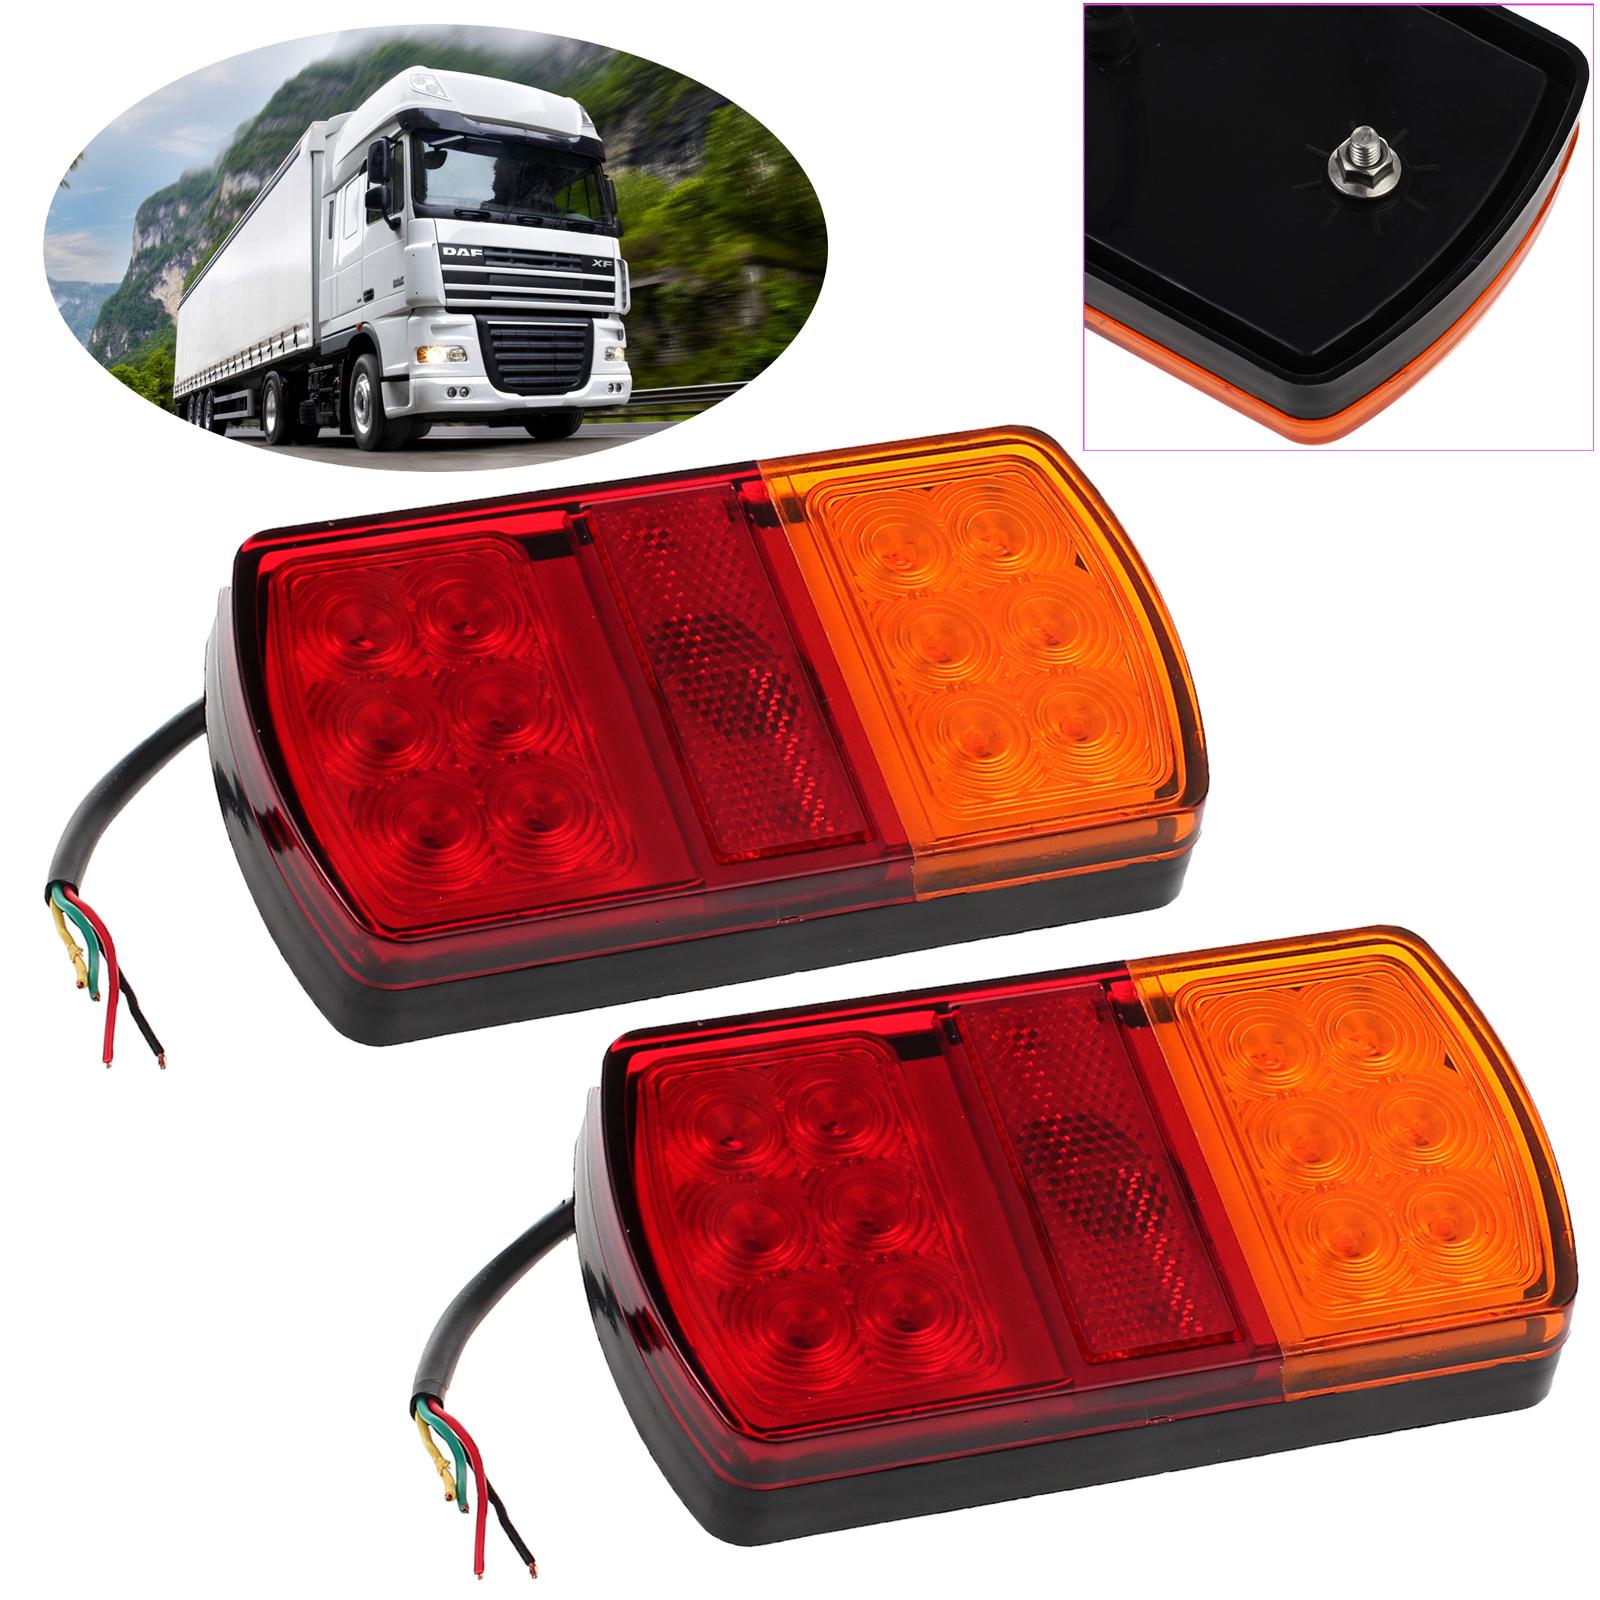 2x 12led Car Stop Brake Tail Lights Waterproof Truck Boat